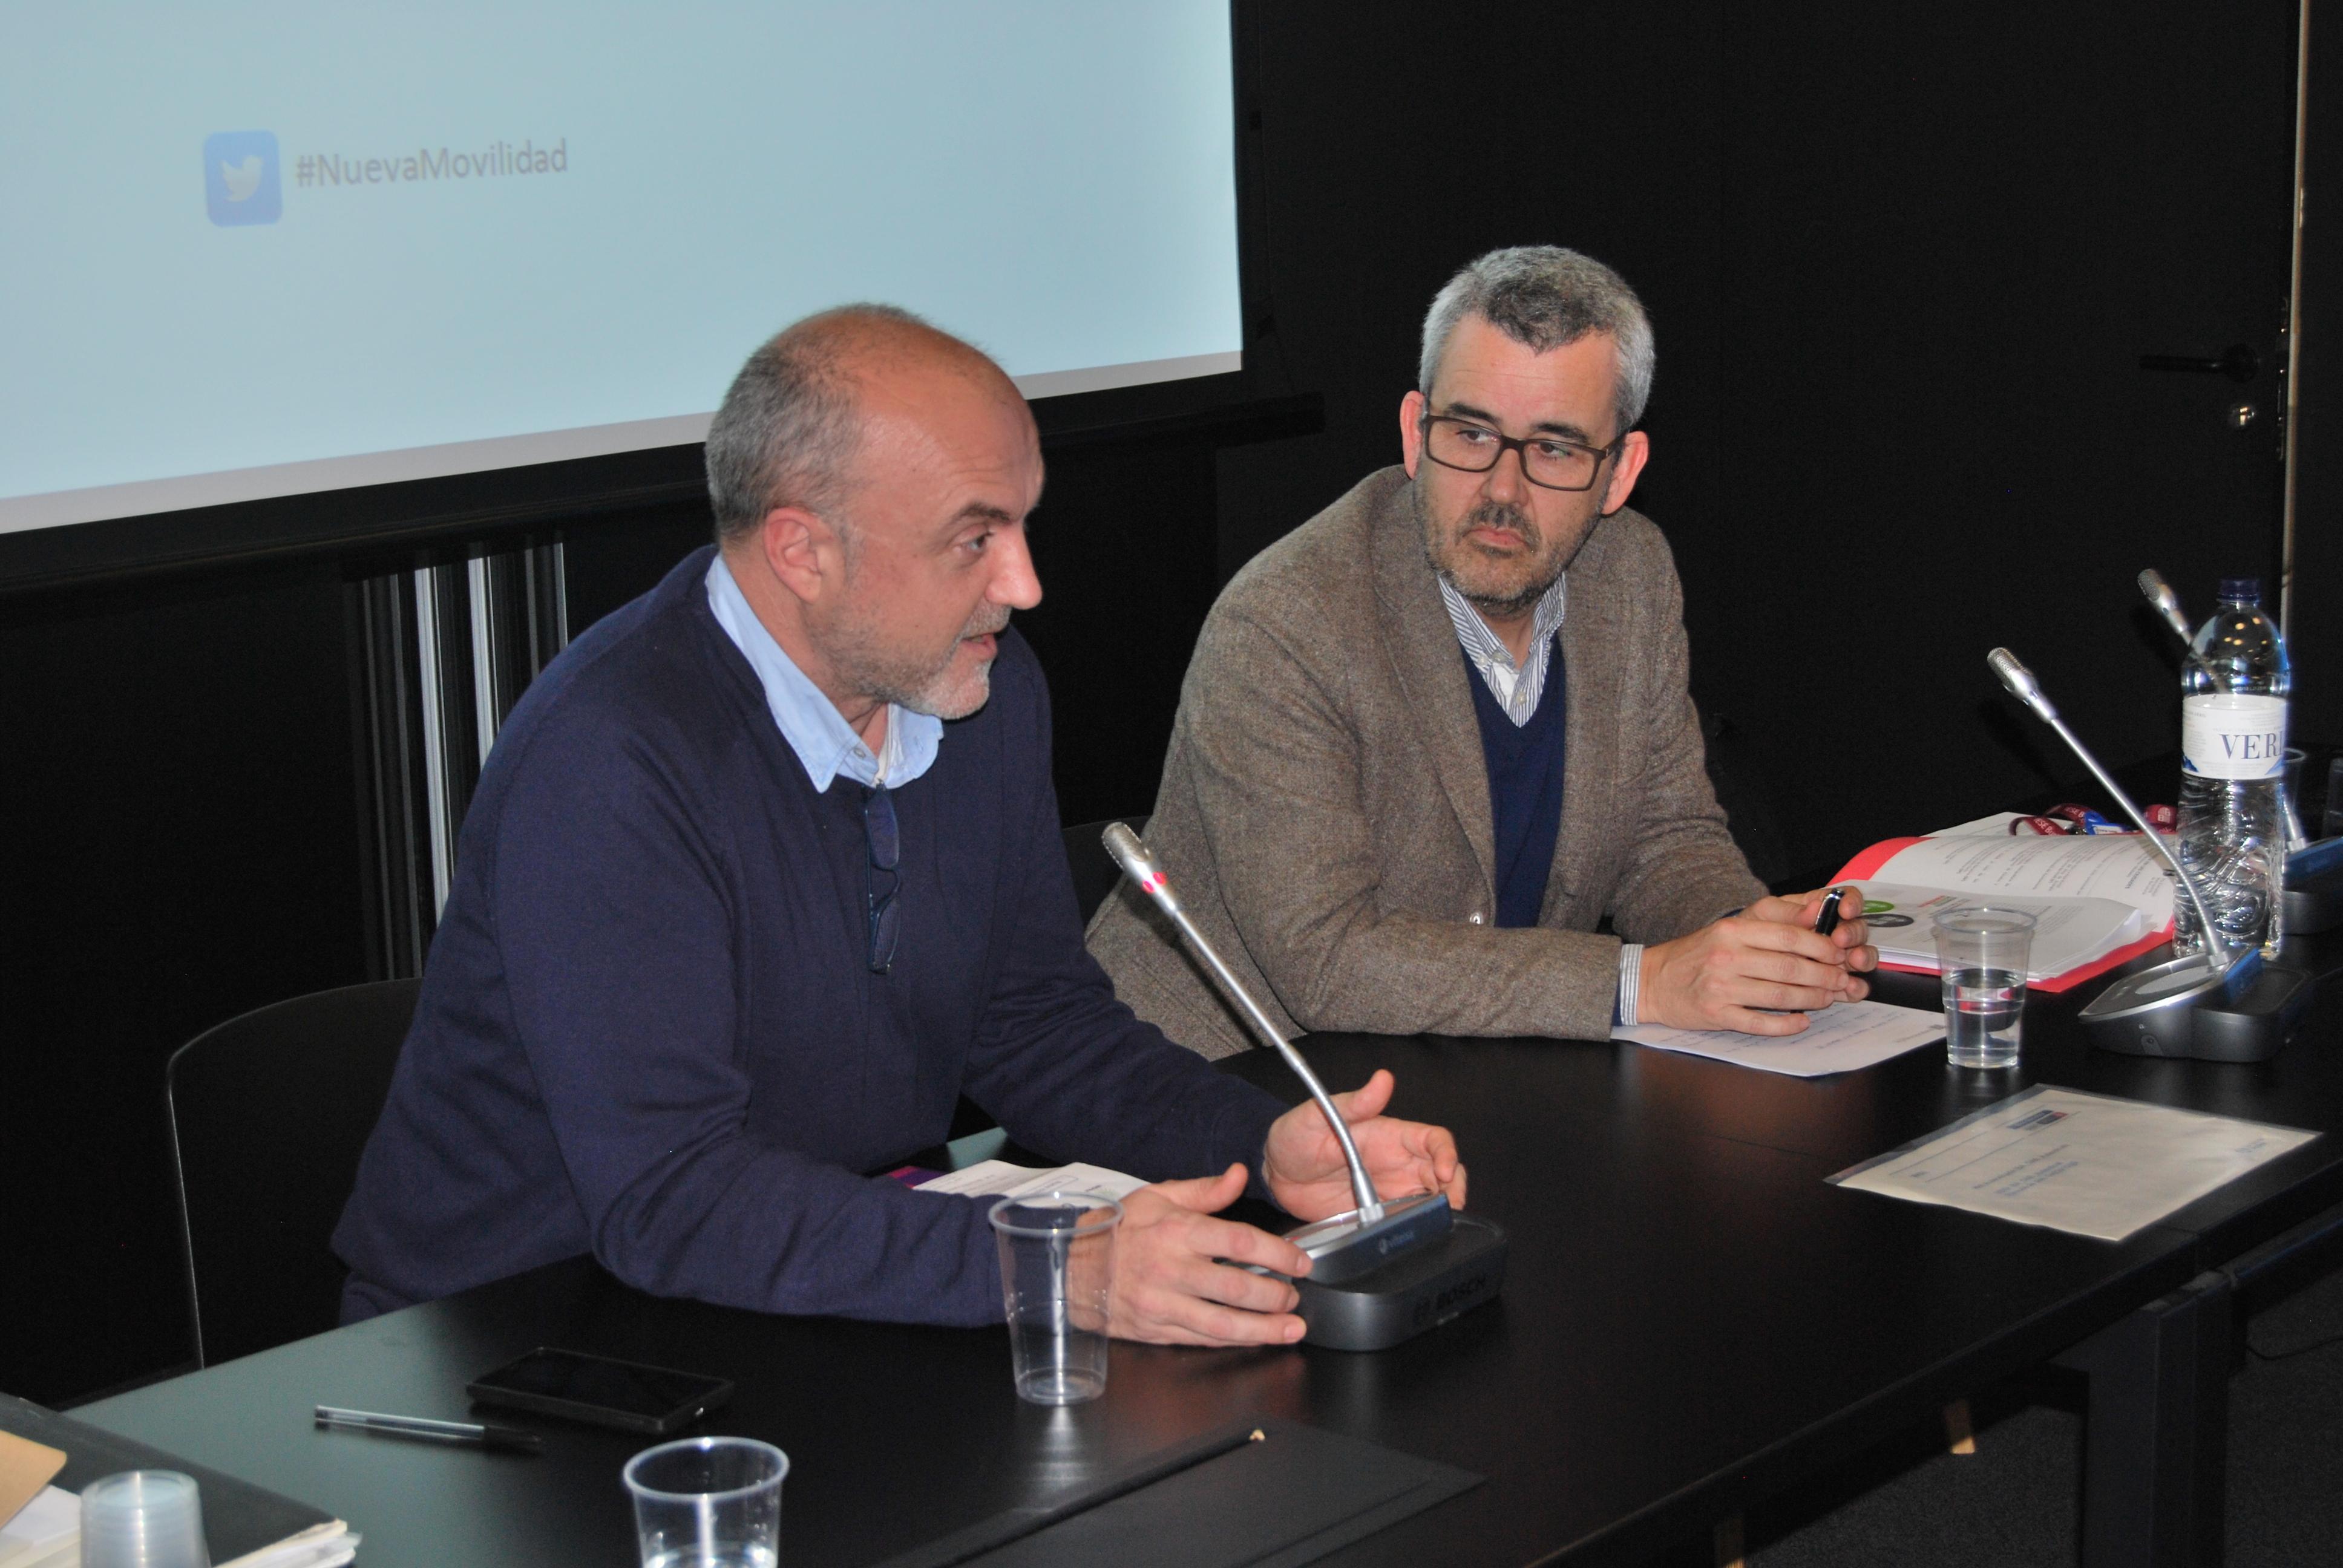 Oriol Estela i Agustín Fernández de Losada (Tornos Abogados) expliquen la Nova Agenda Post Habitat III